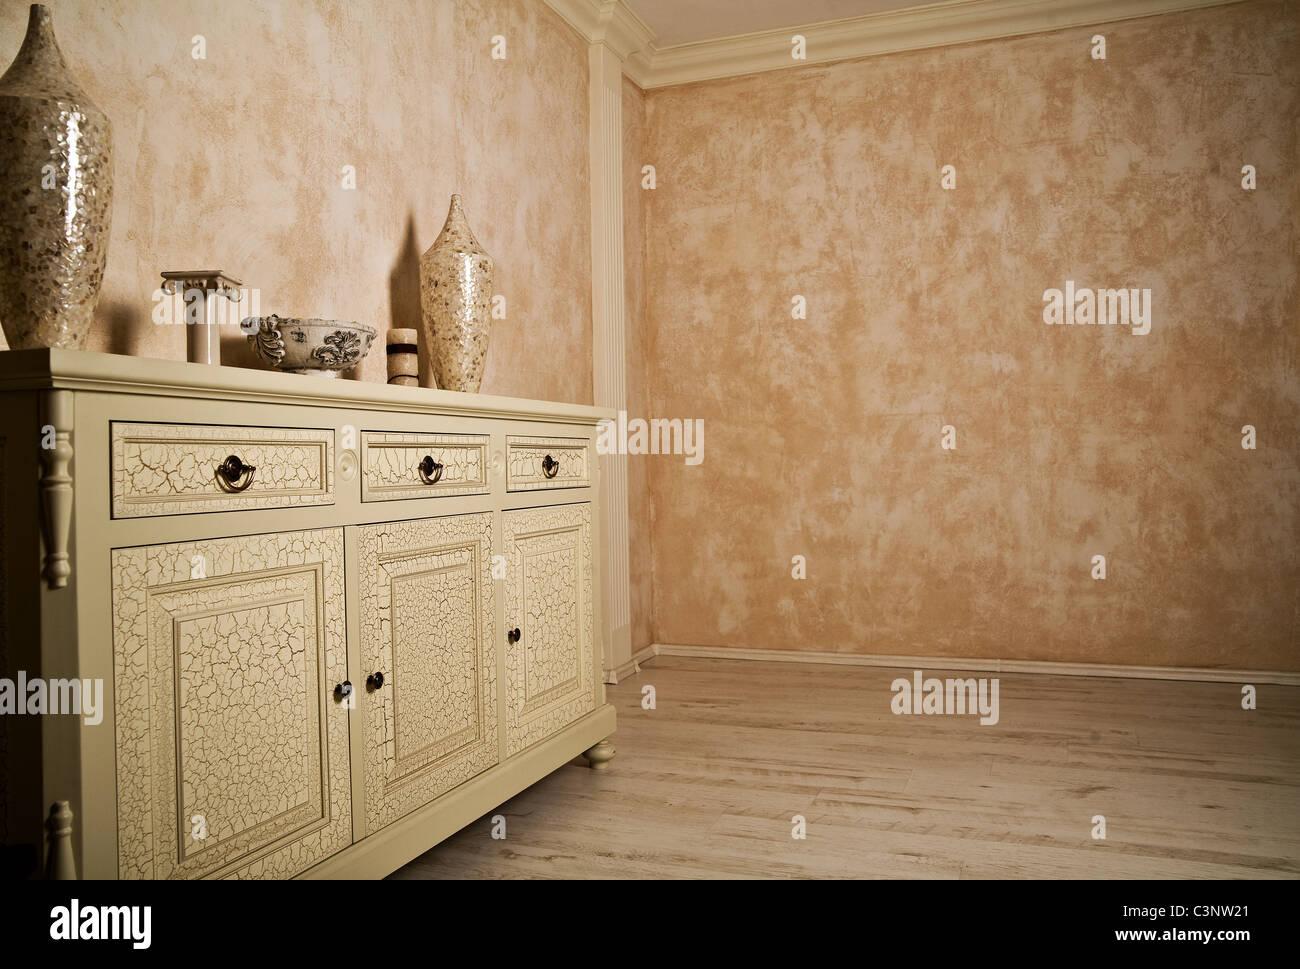 Minimalism designed beige room - Stock Image